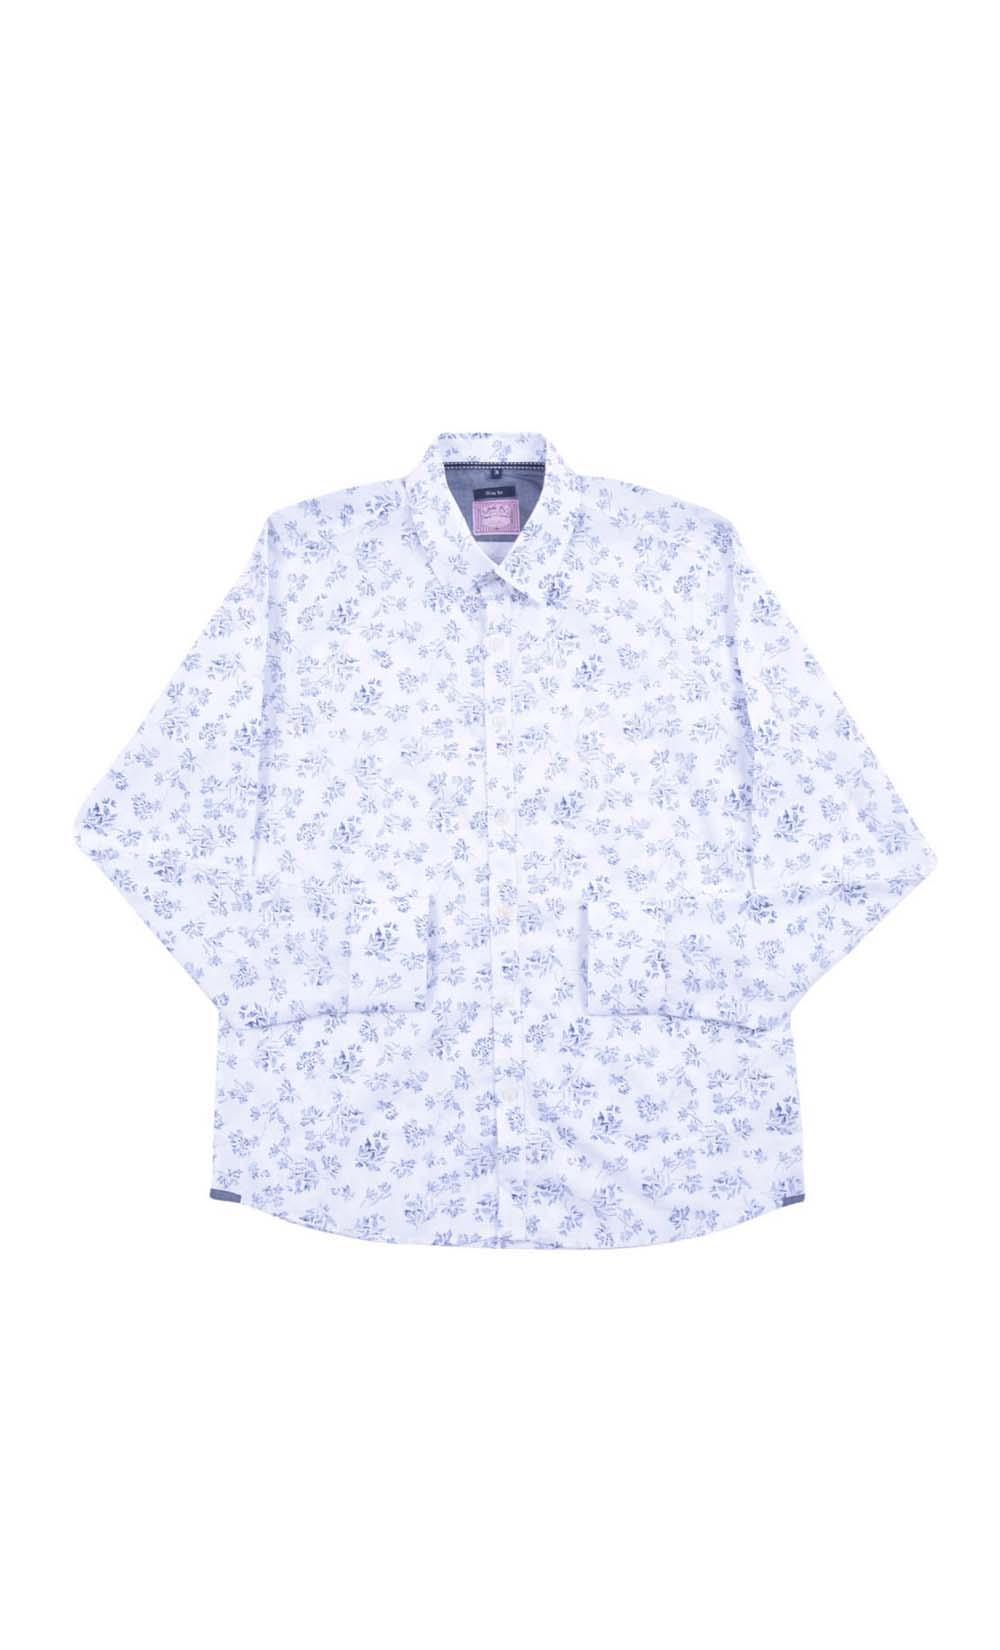 Camisa Floral Manga longa Jota k